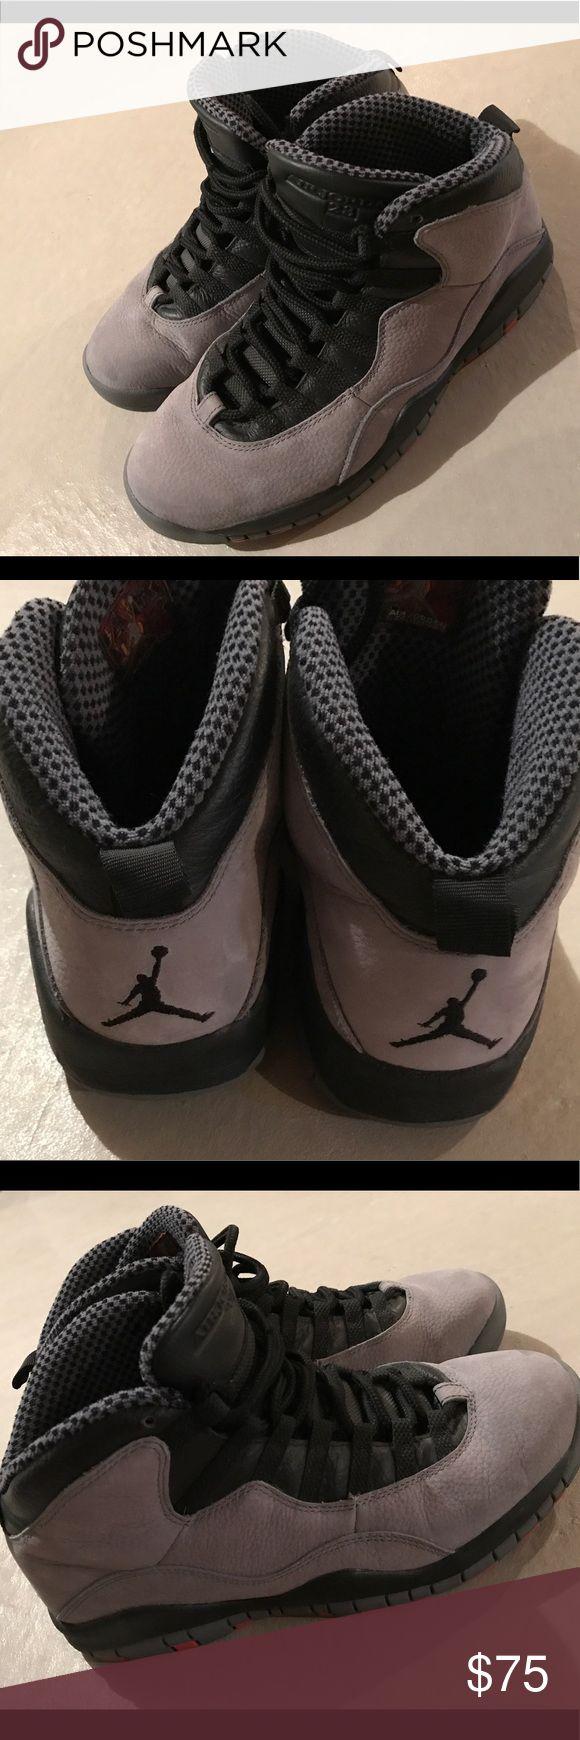 Jordan retro 10 Great condition. Barely worn. Air Jordan Shoes Athletic Shoes